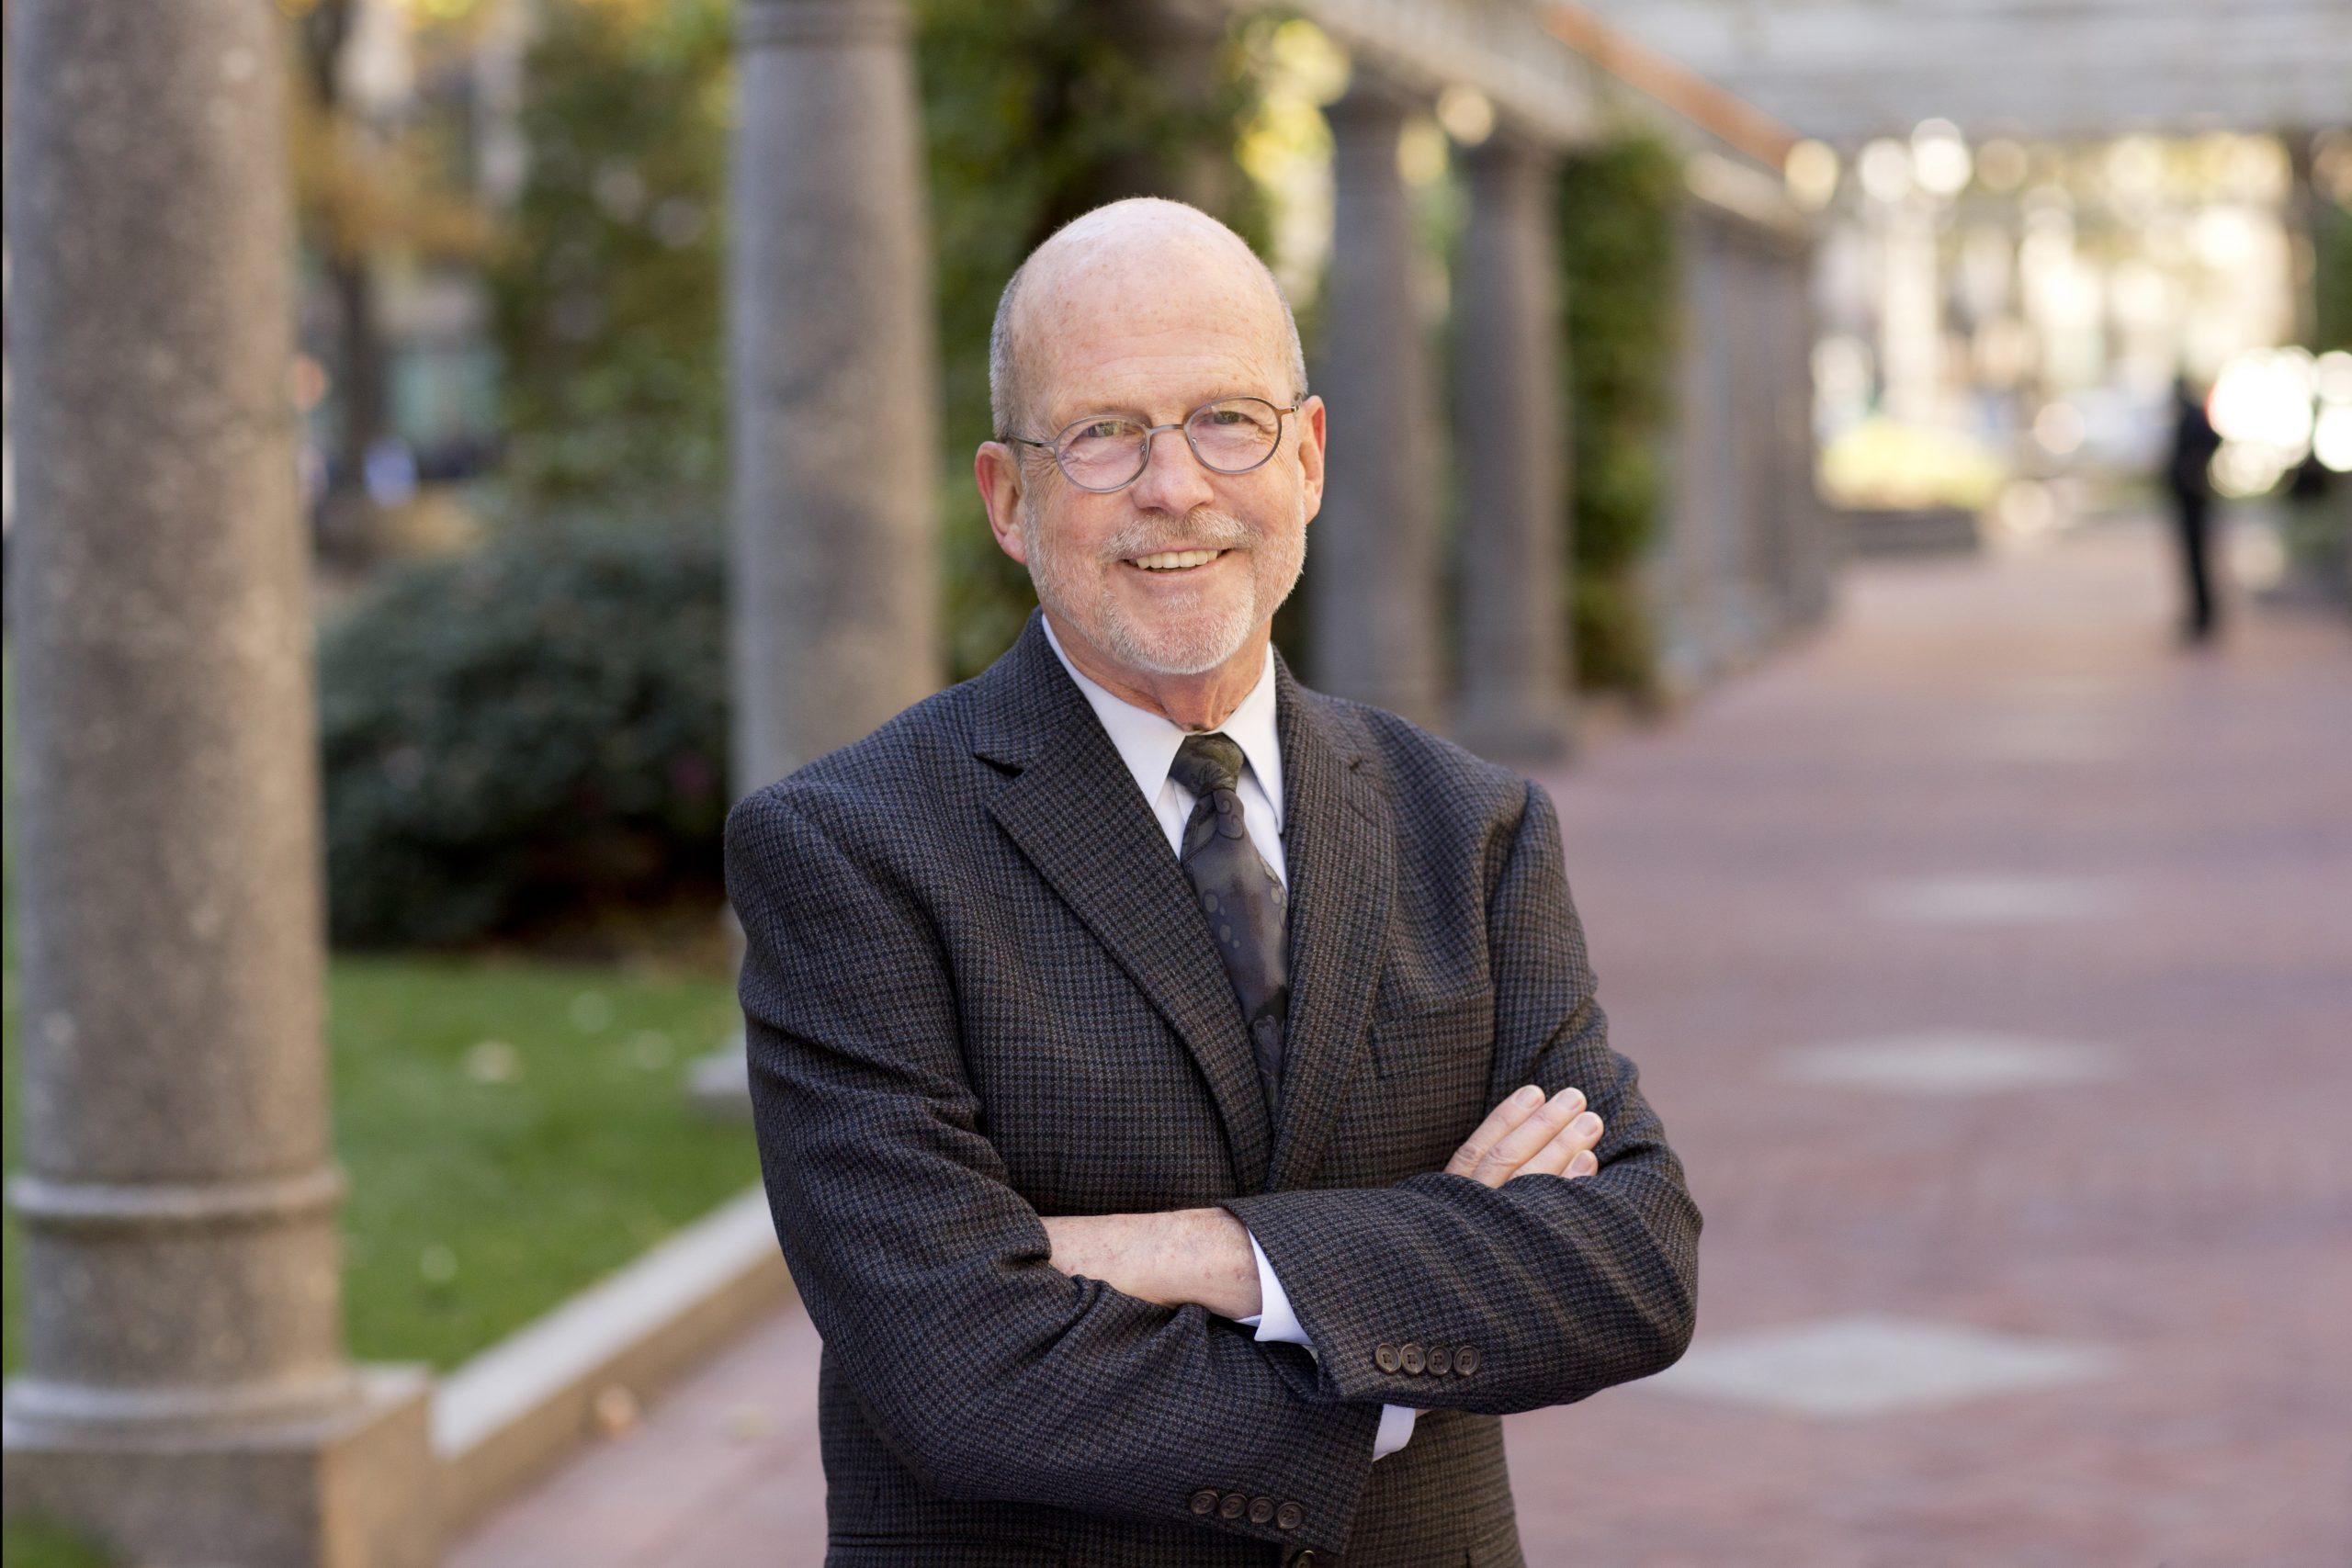 Chuck Krumroy, Partner at Barrington Partners